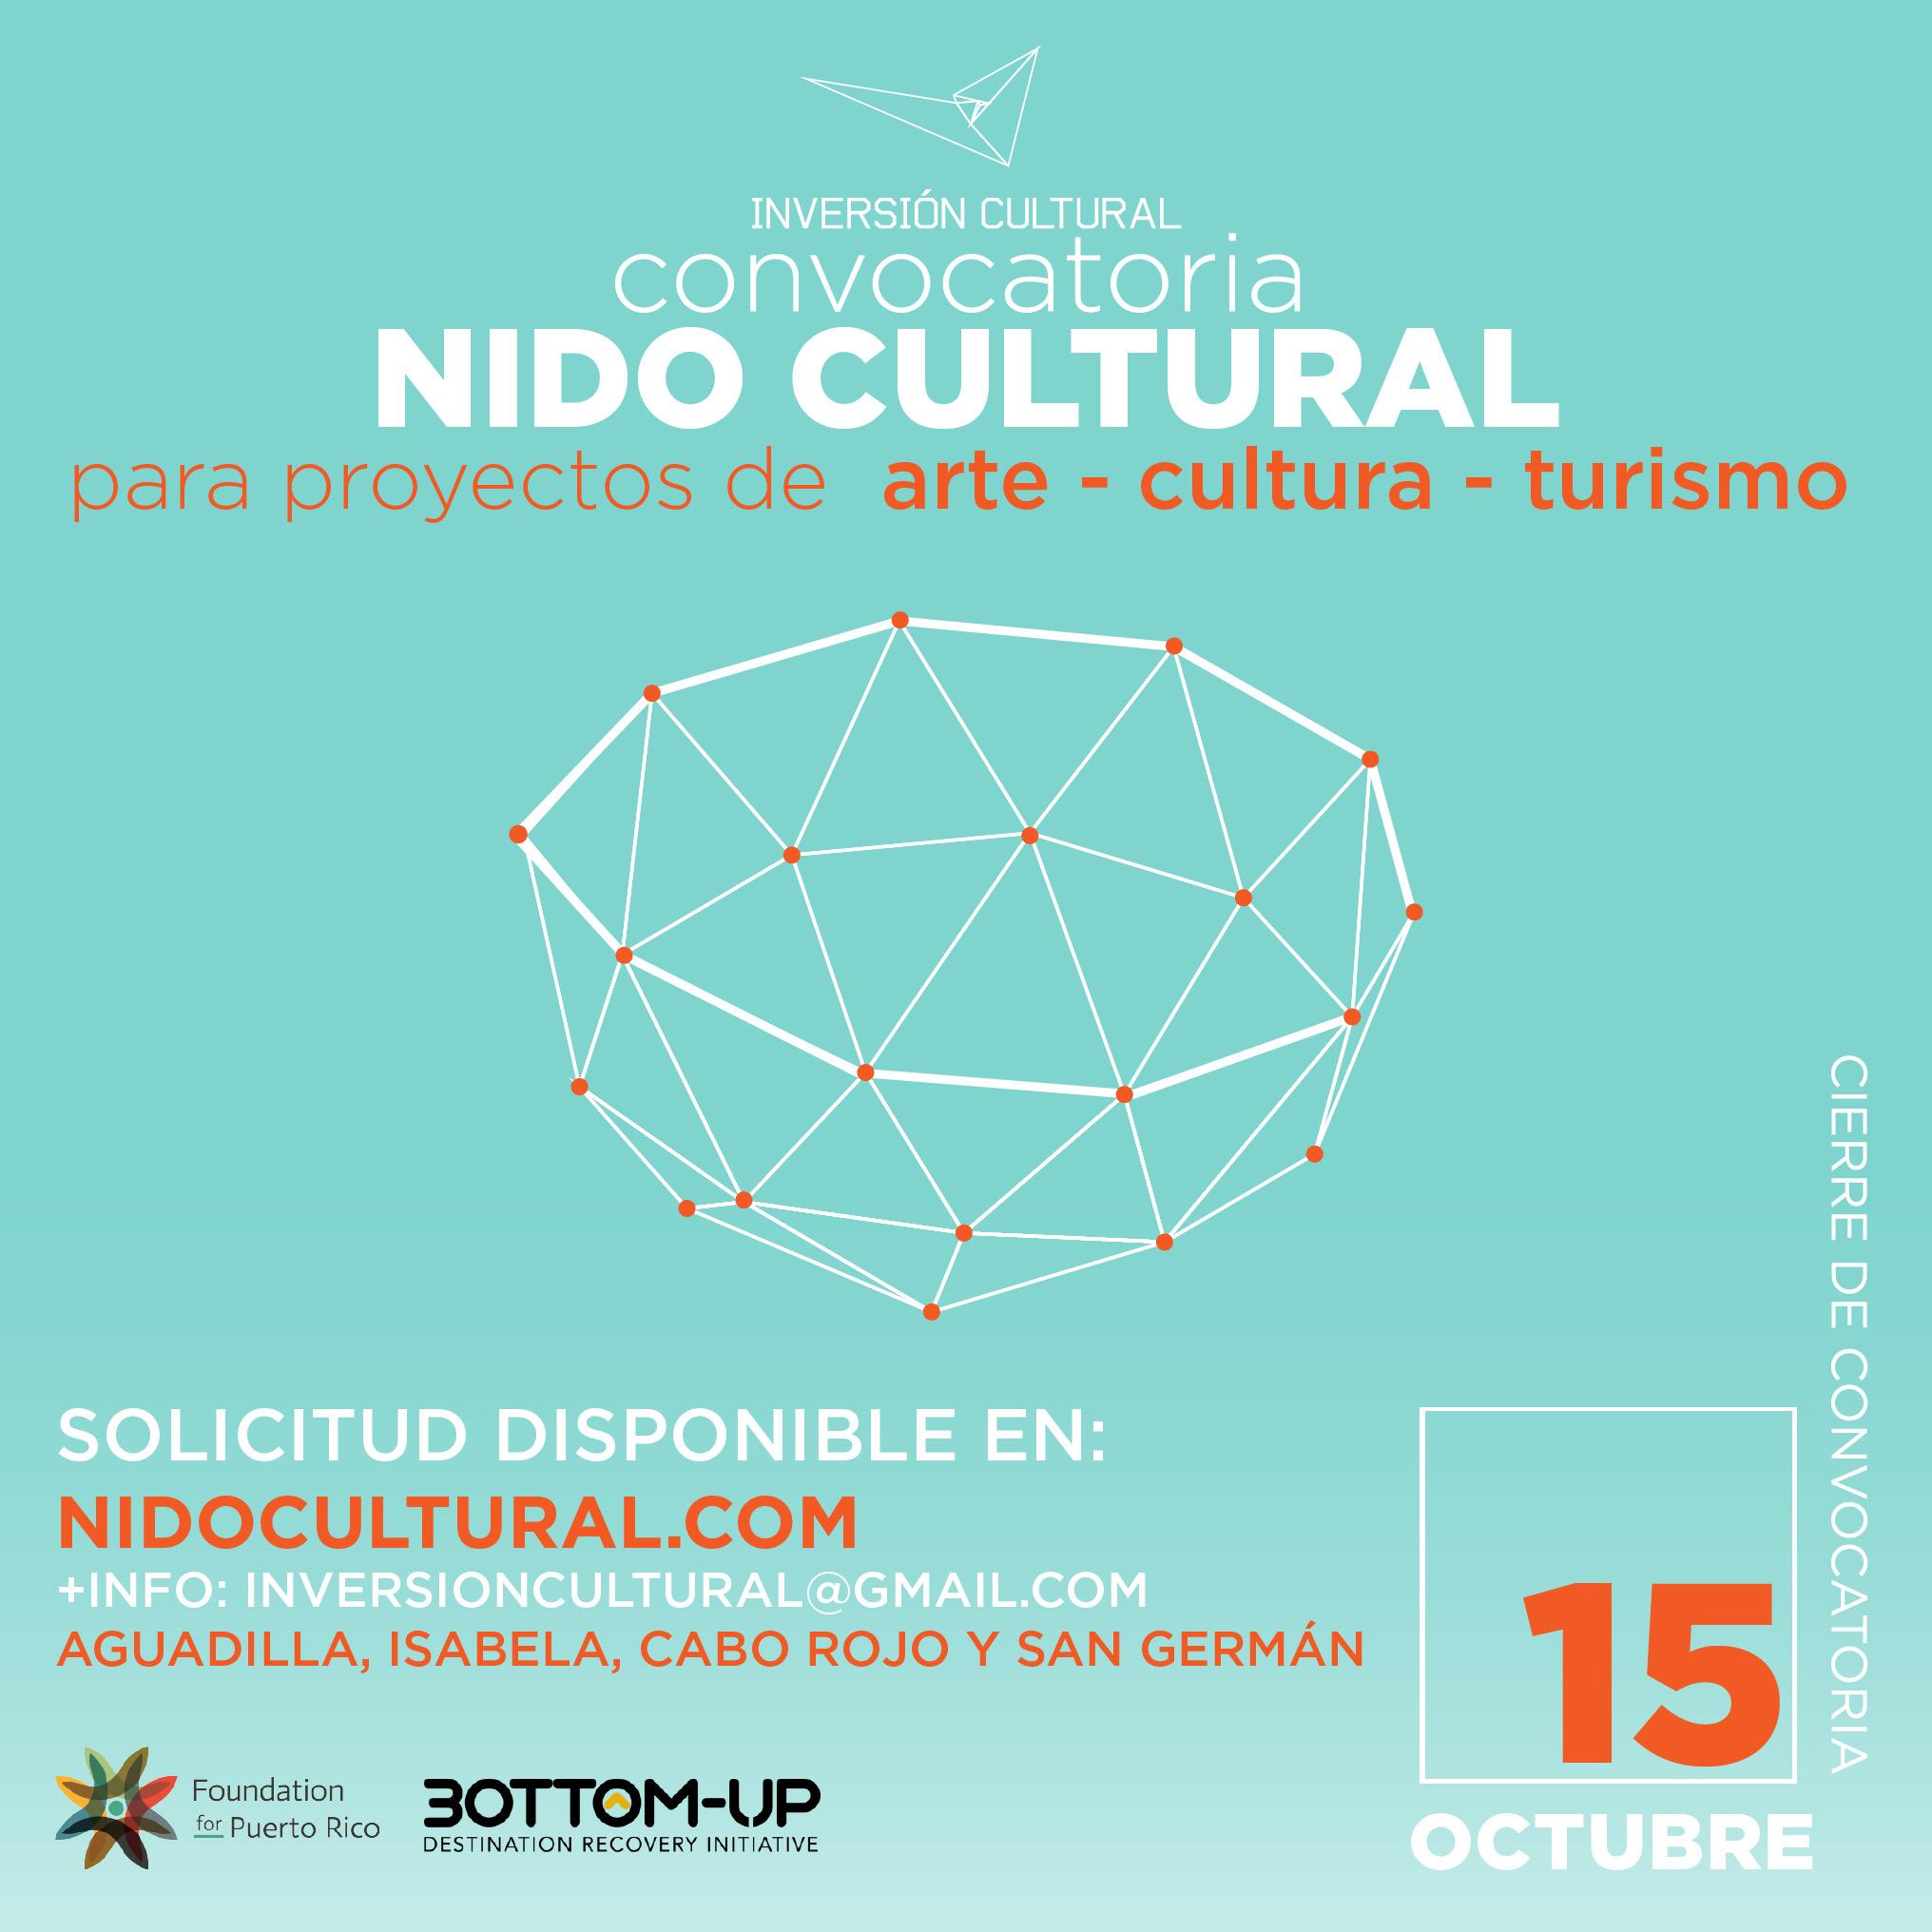 Promo - Nido Cultural - Bottom-up